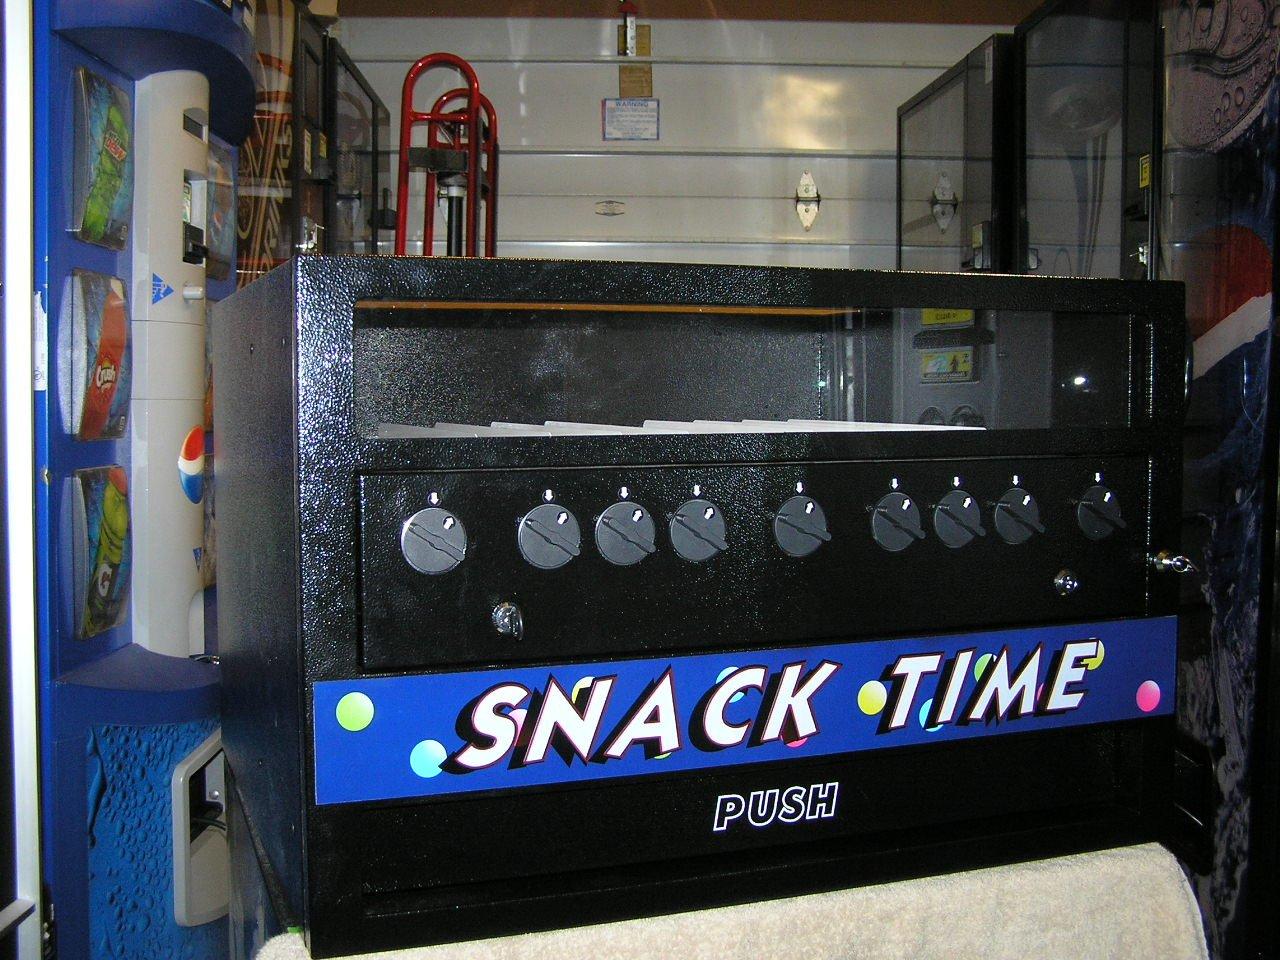 VM250, VM200 & VM251 Snack Or Drink Vending Machine Tubular SM25 Key - New/!